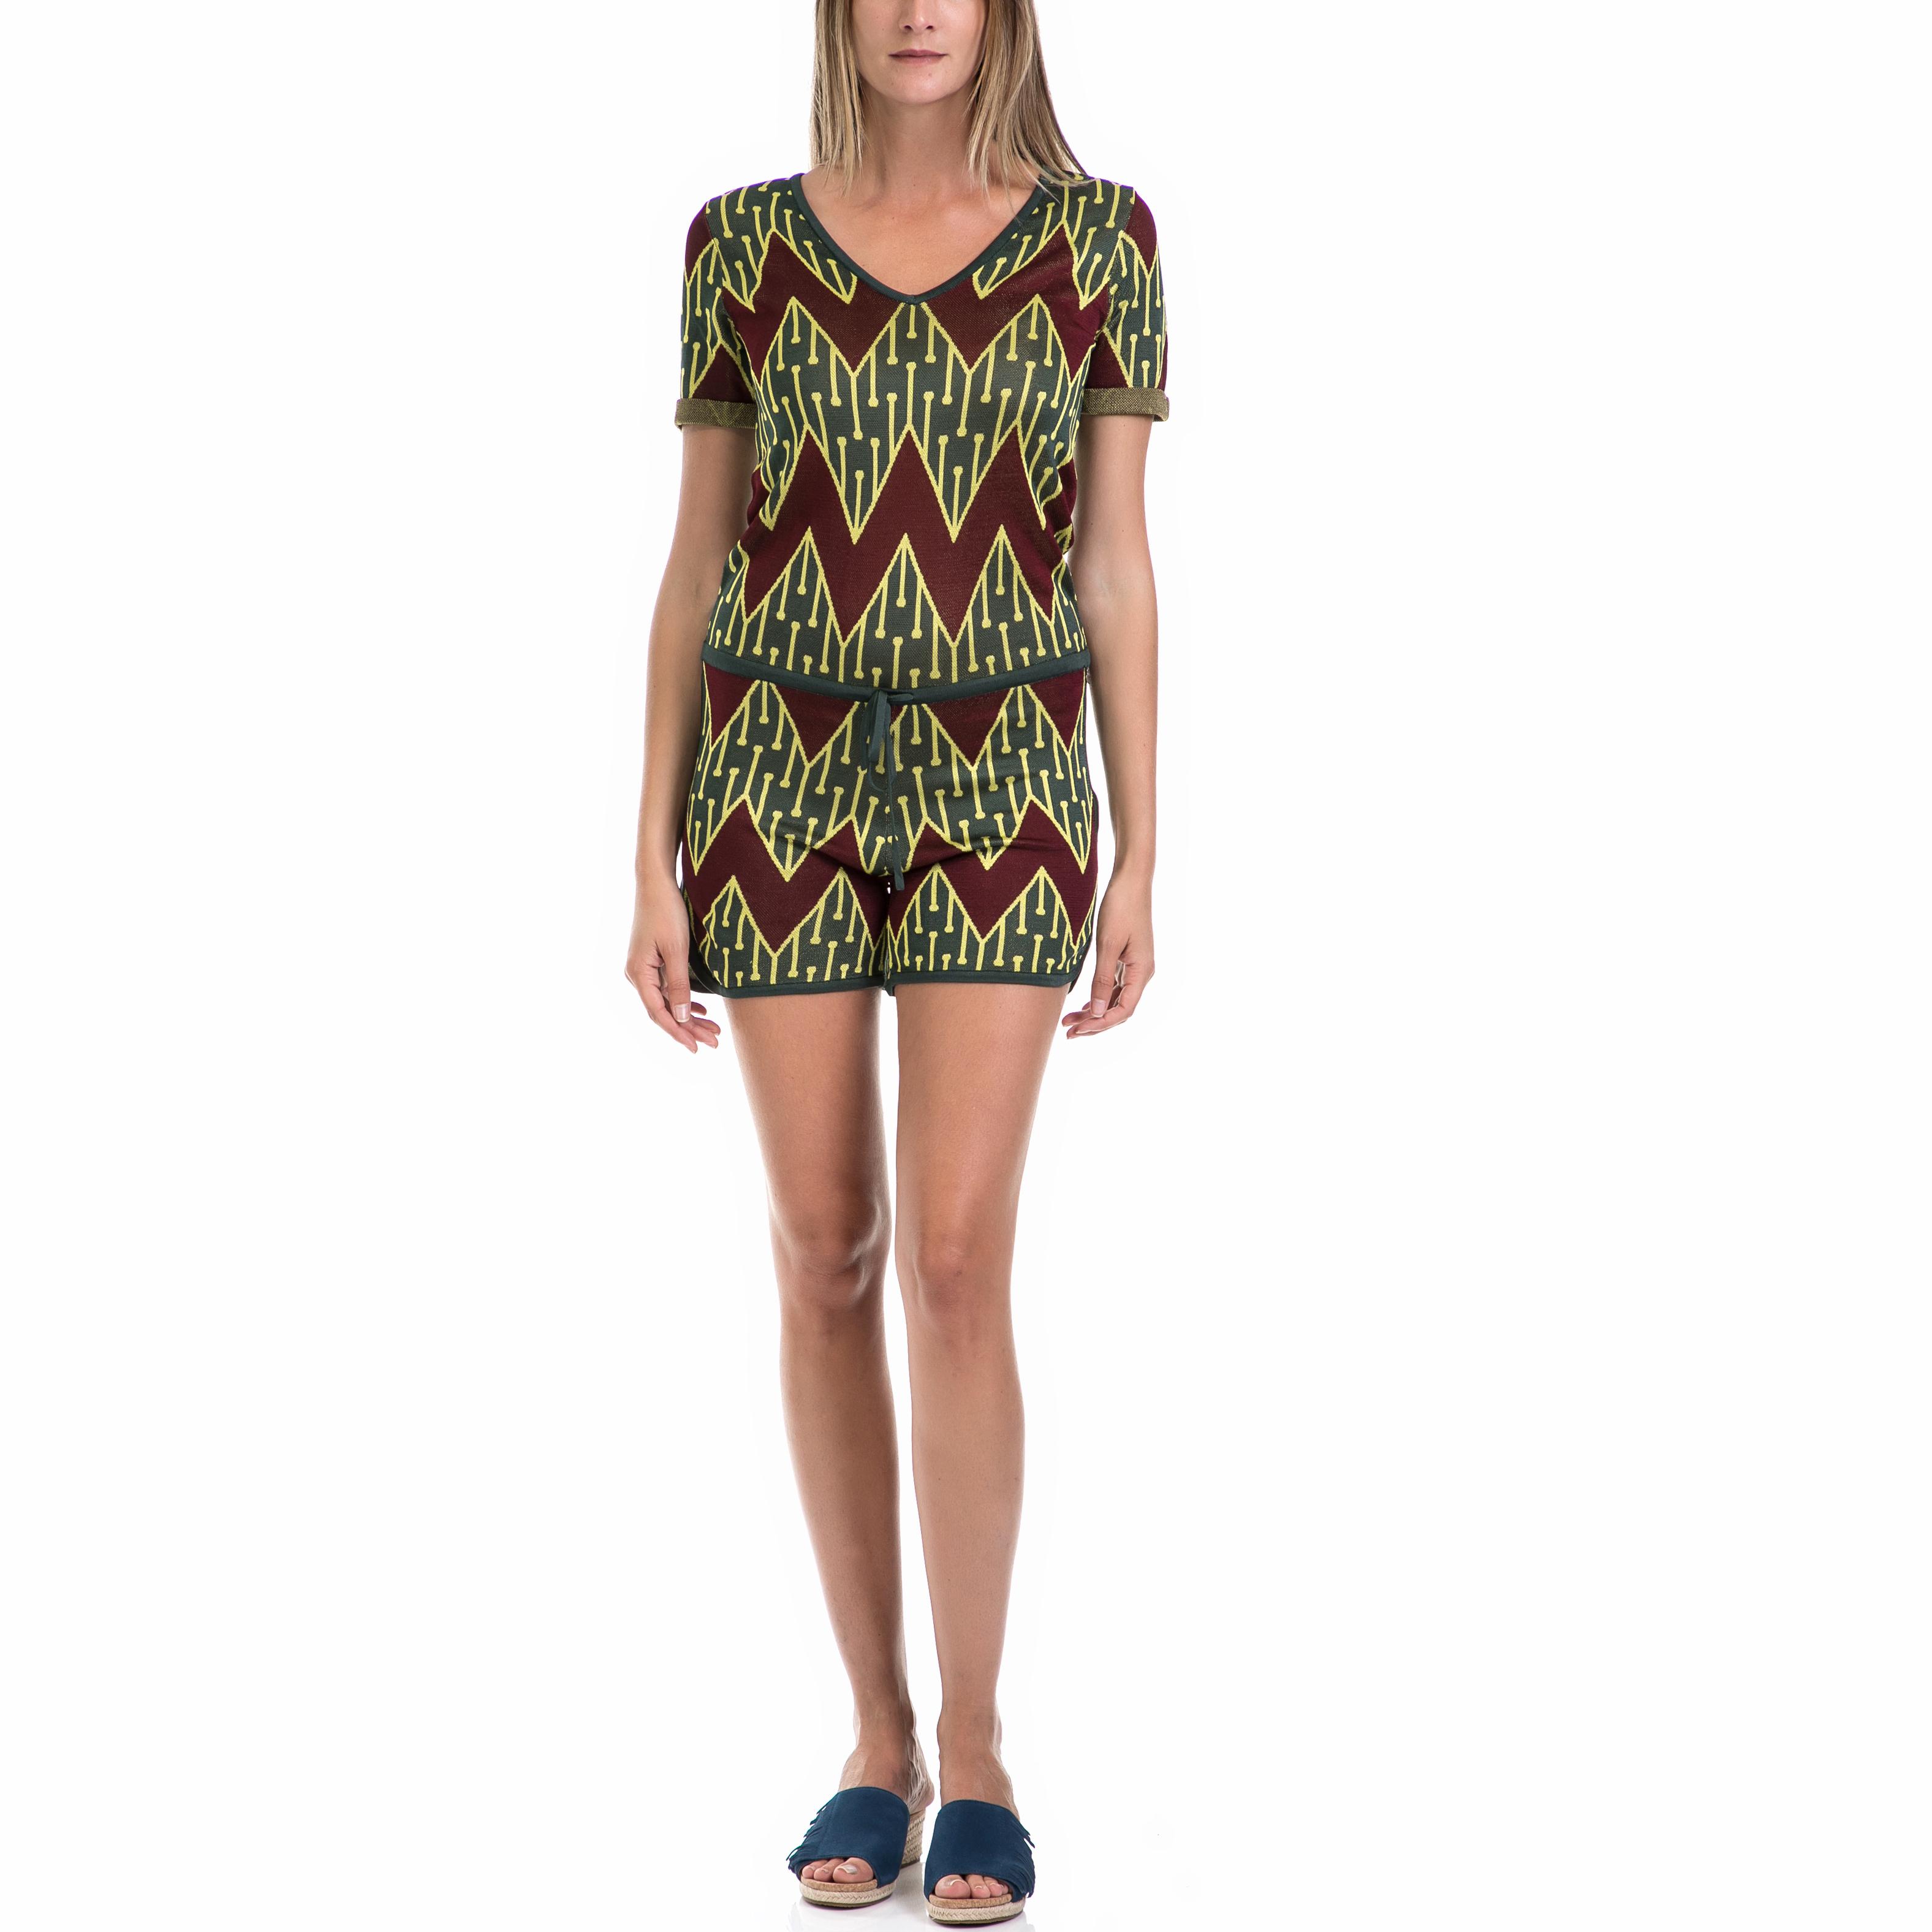 MAISON SCOTCH – Γυναικεία ολόσωμη φόρμα MAISON SCOTCH πράσινη-καφέ